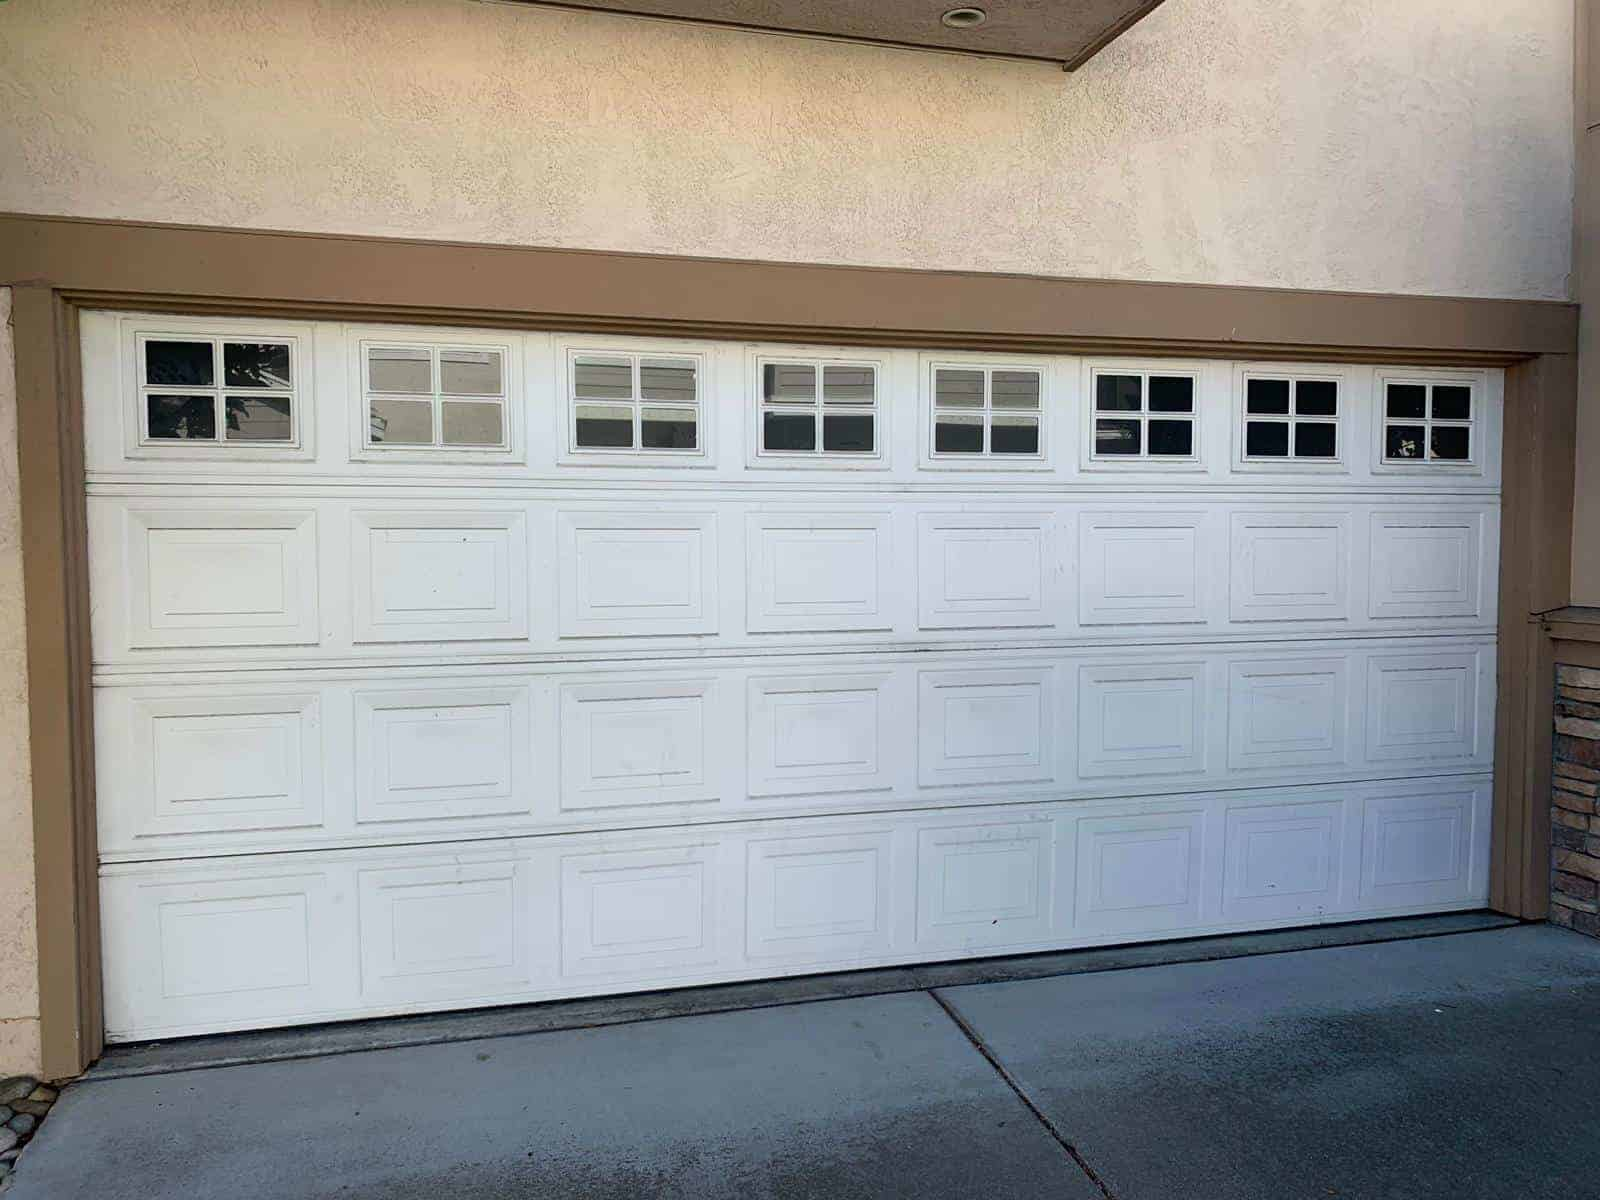 San Dimas CA Garage Door Repair & Replacement